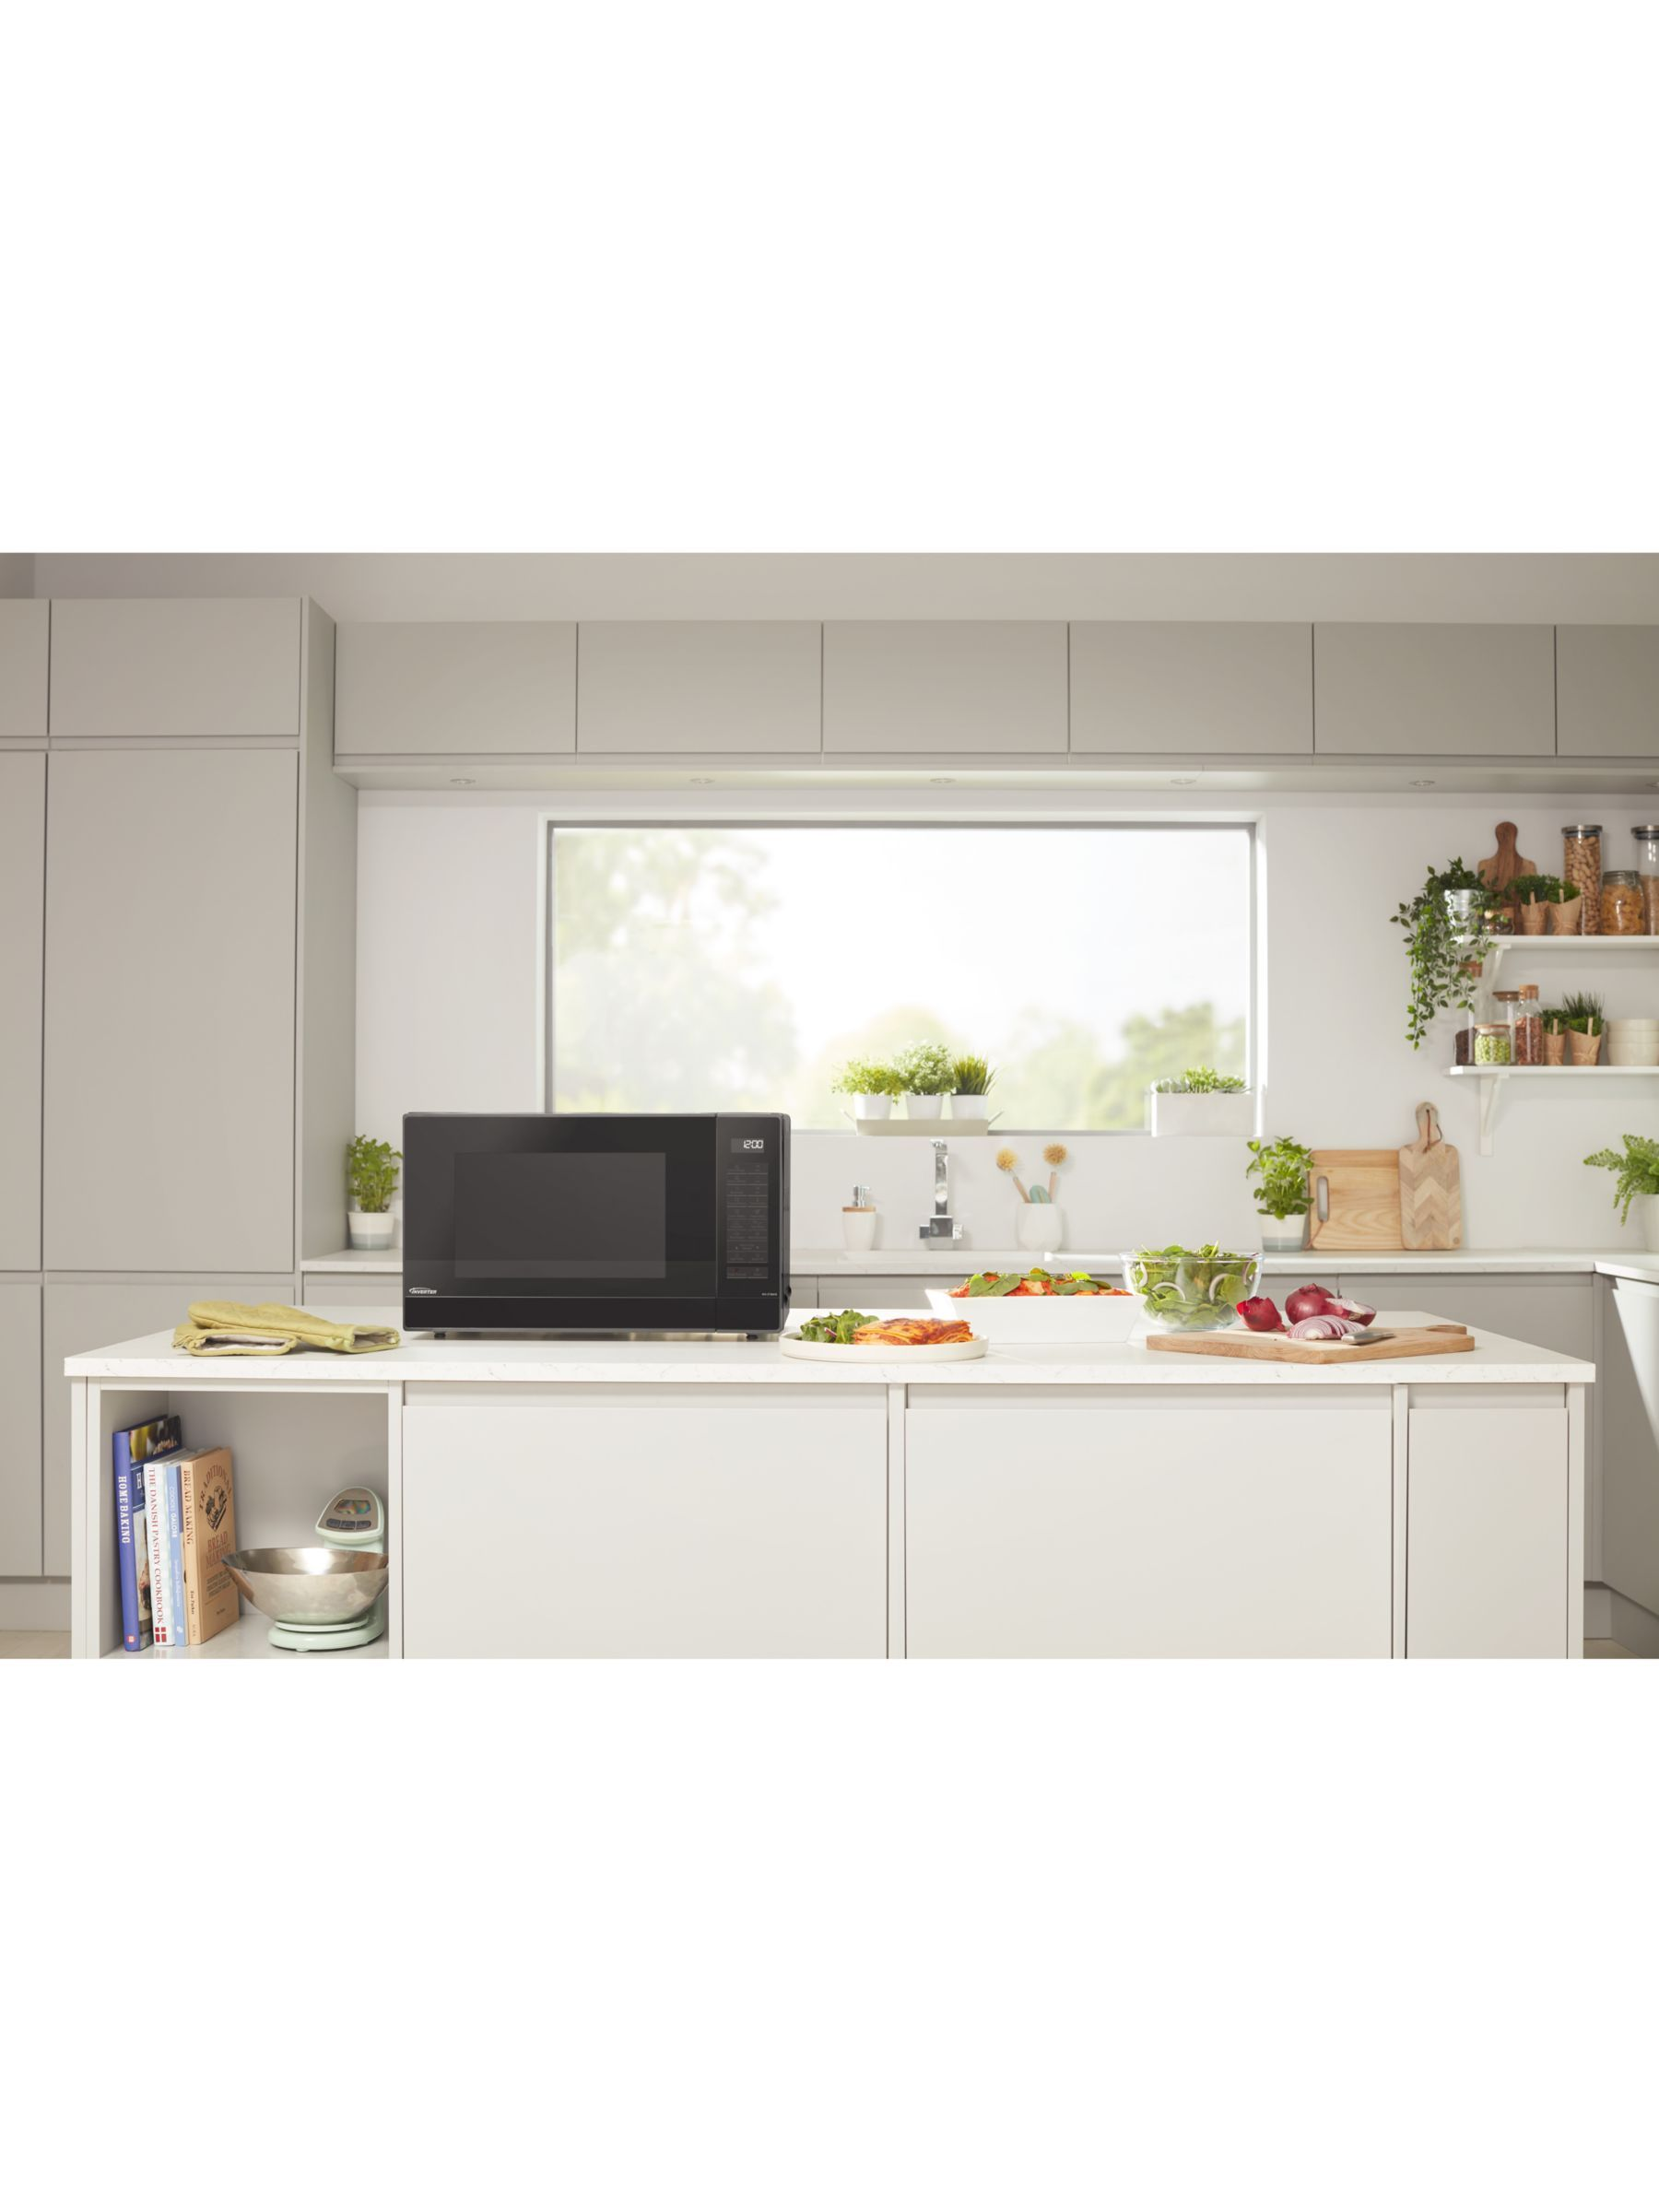 Slimline Microwave Ovens Bestmicrowave